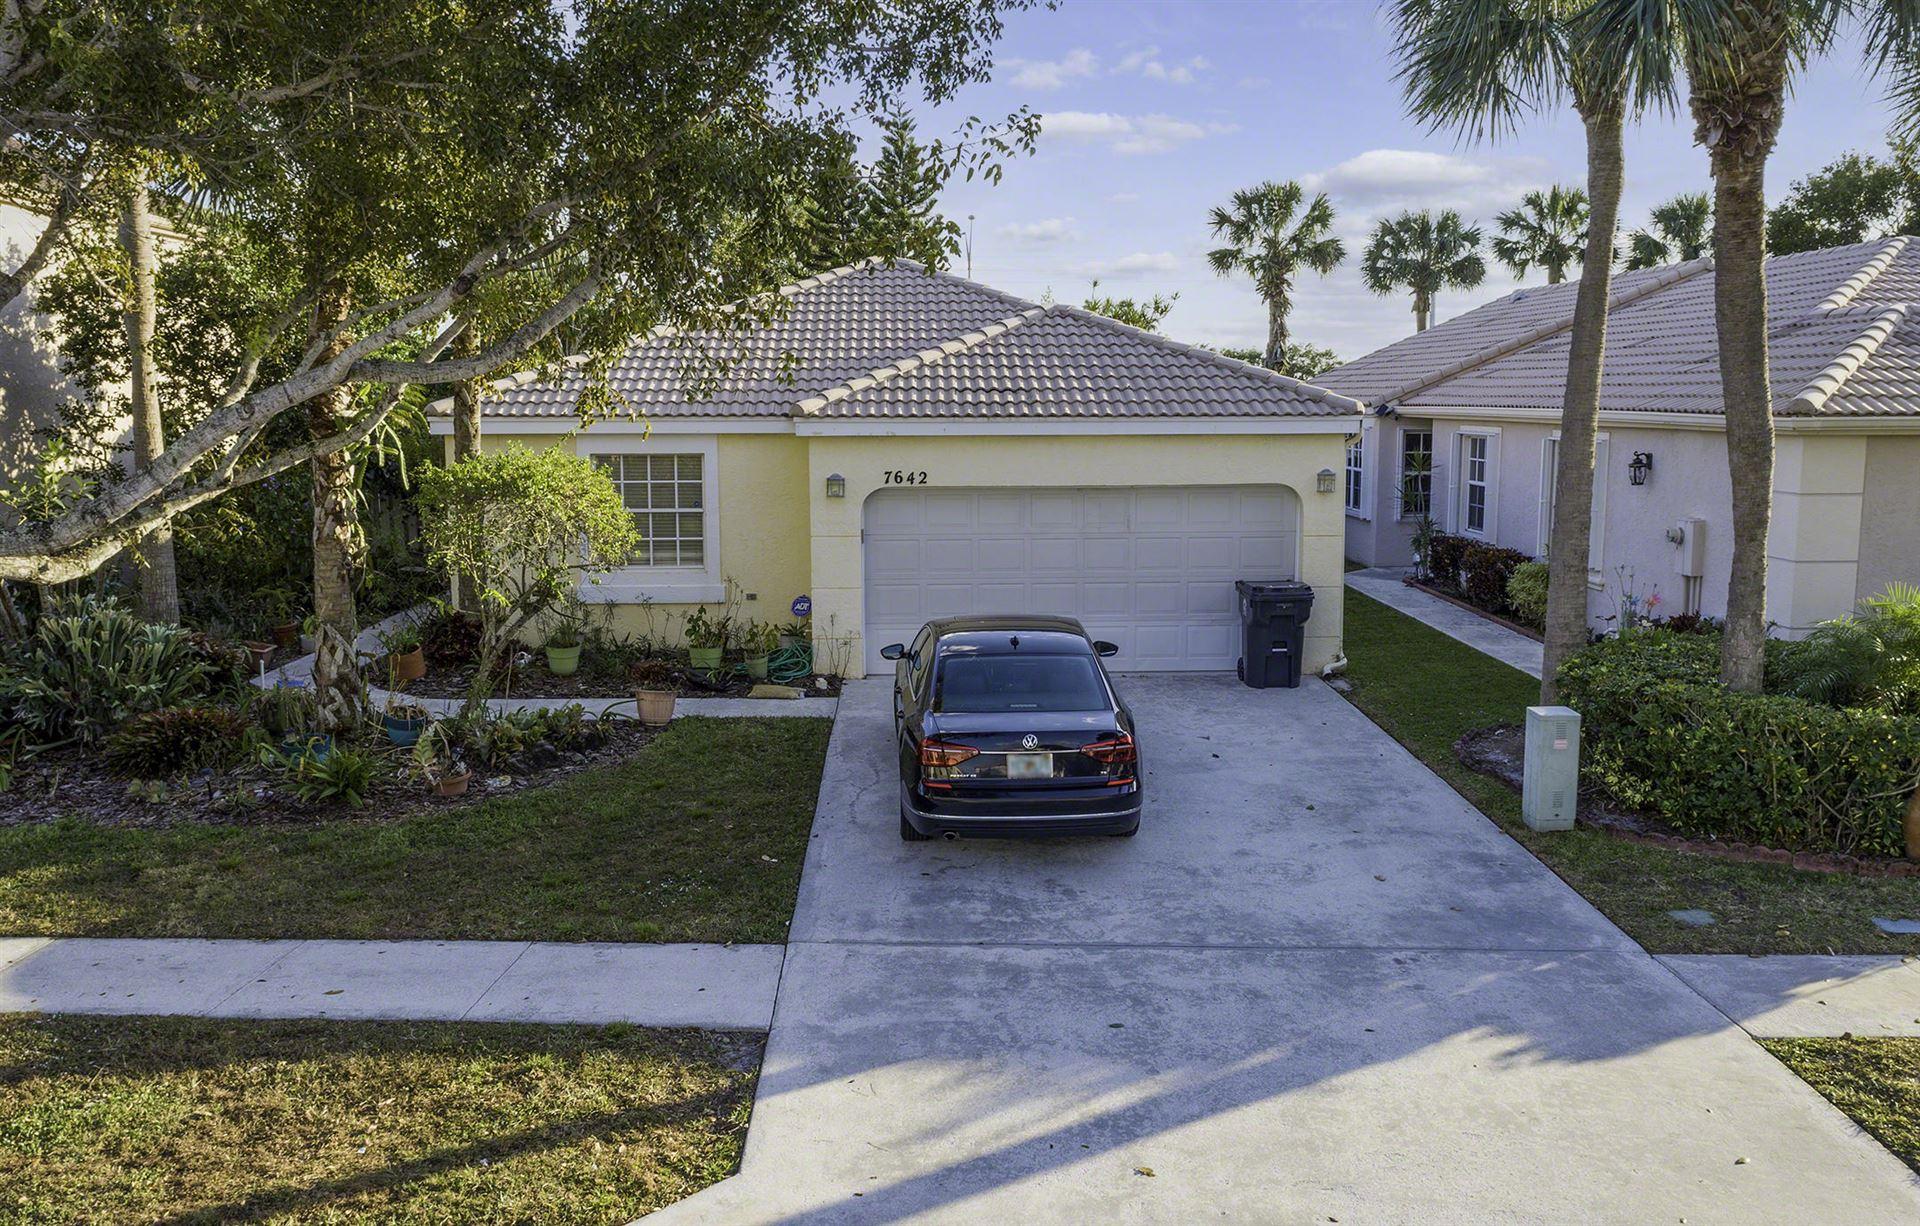 7642 Rockport Circle, Lake Worth, FL 33467 - #: RX-10687999